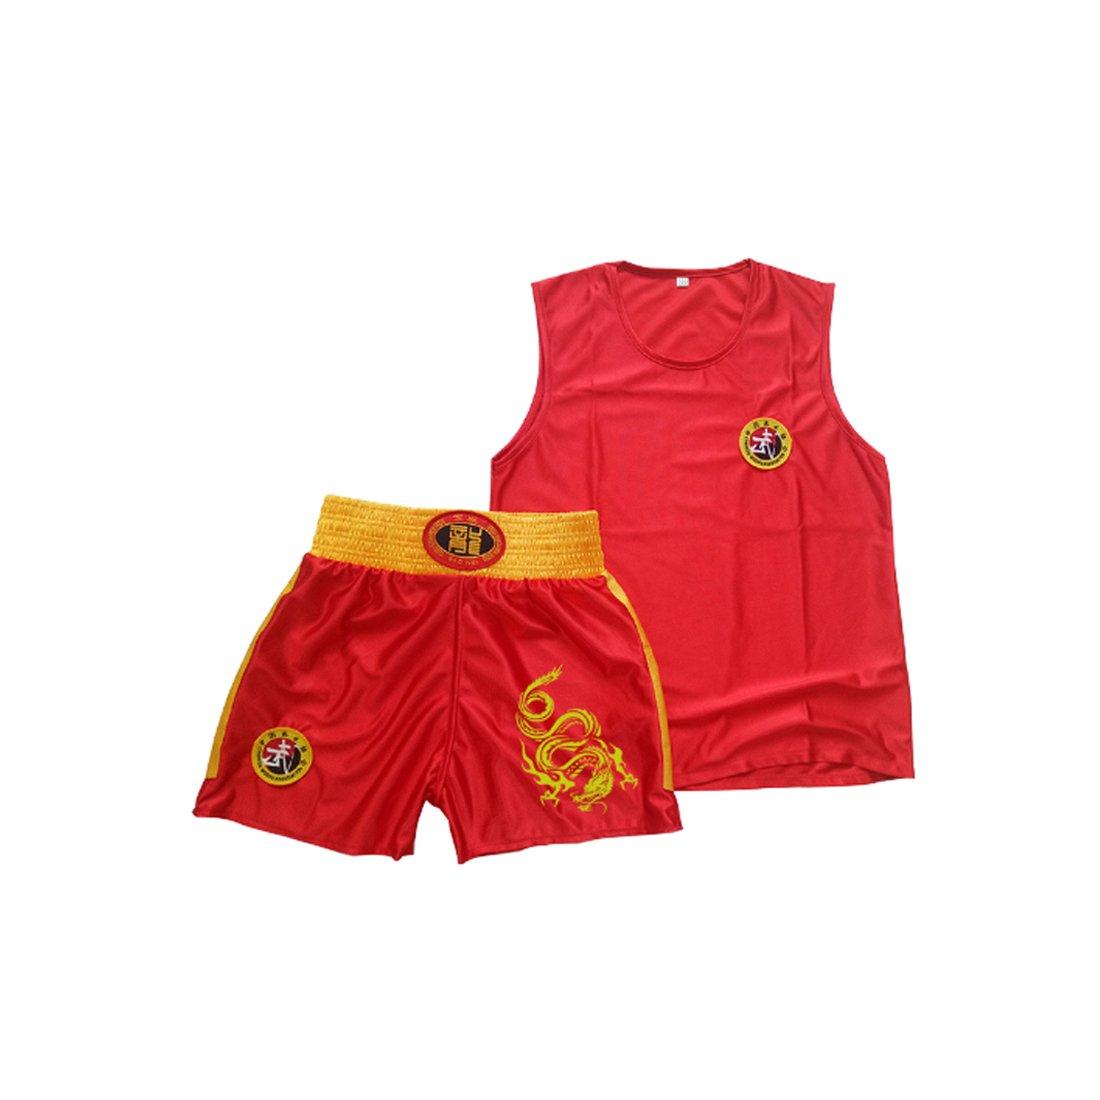 Fulision Men and Women Sanda Boxing Clothing Muay Thai Clothing Training Clothes